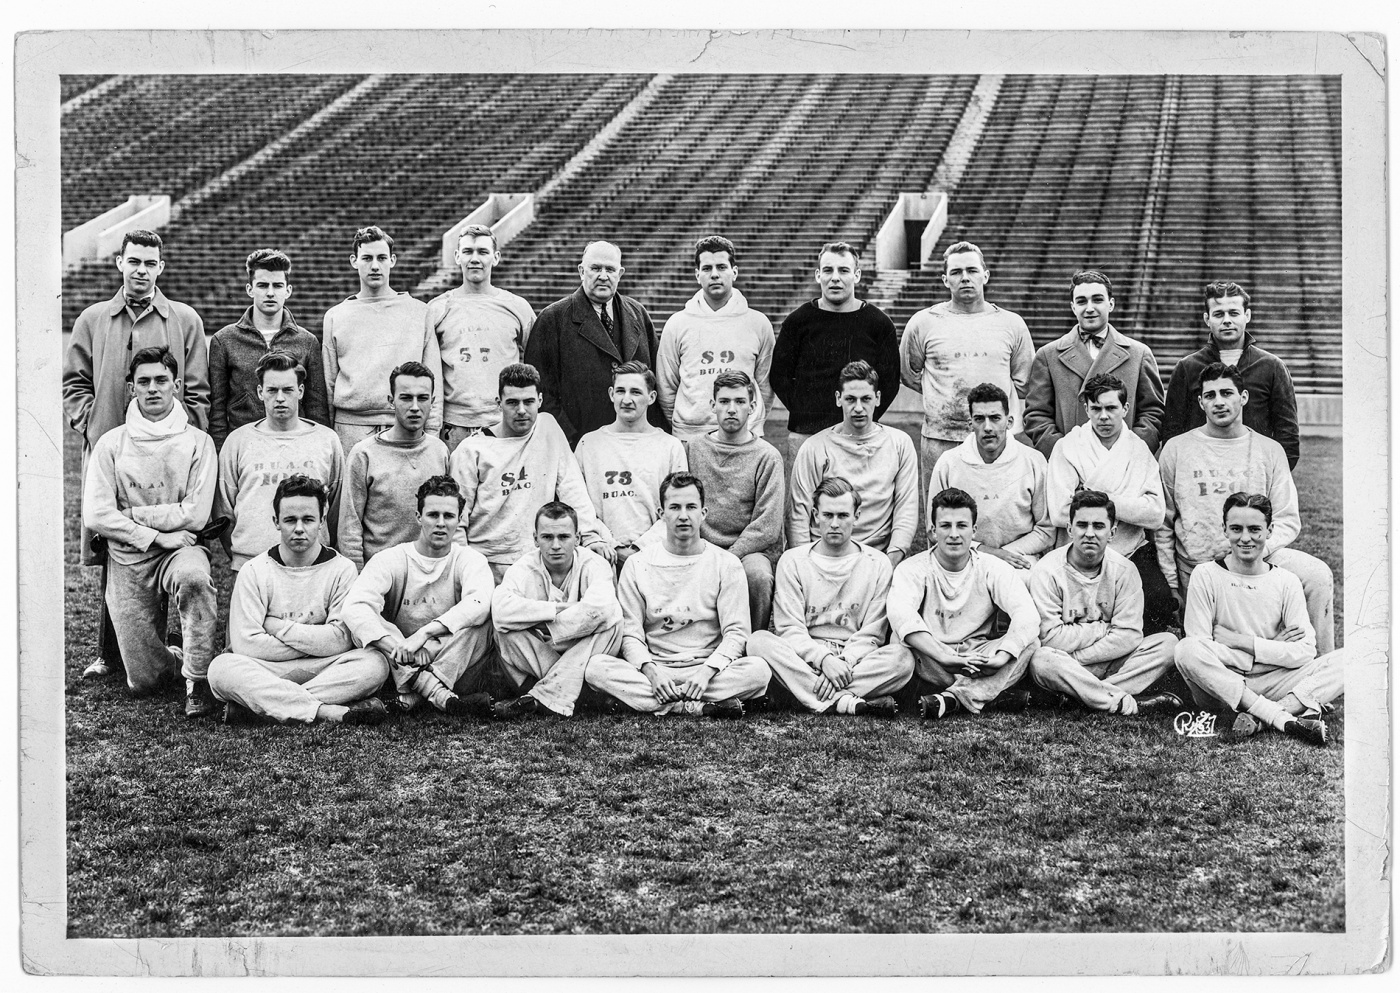 Image of 1940 Brown track team